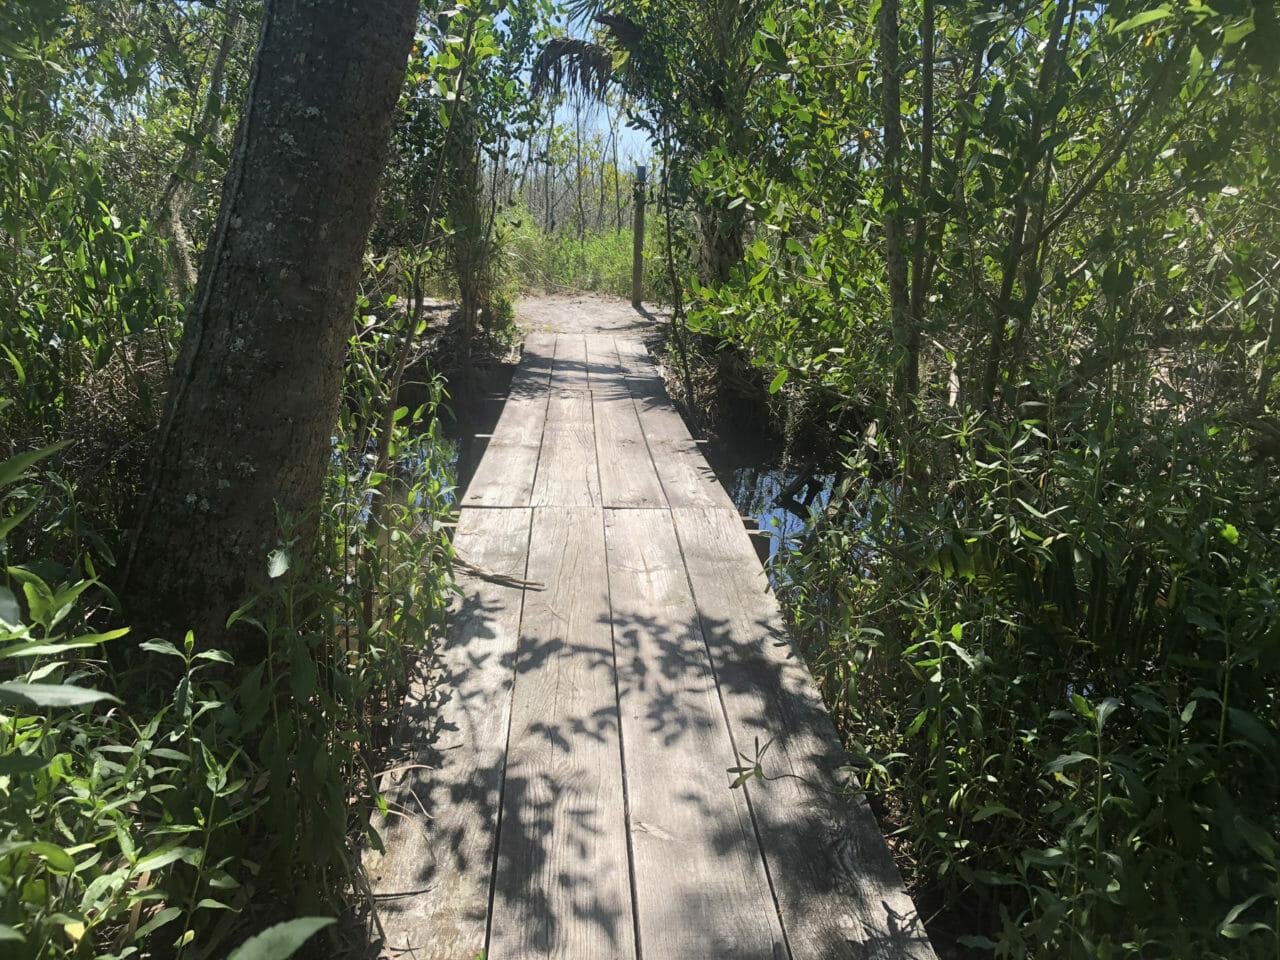 Sams House mangroves